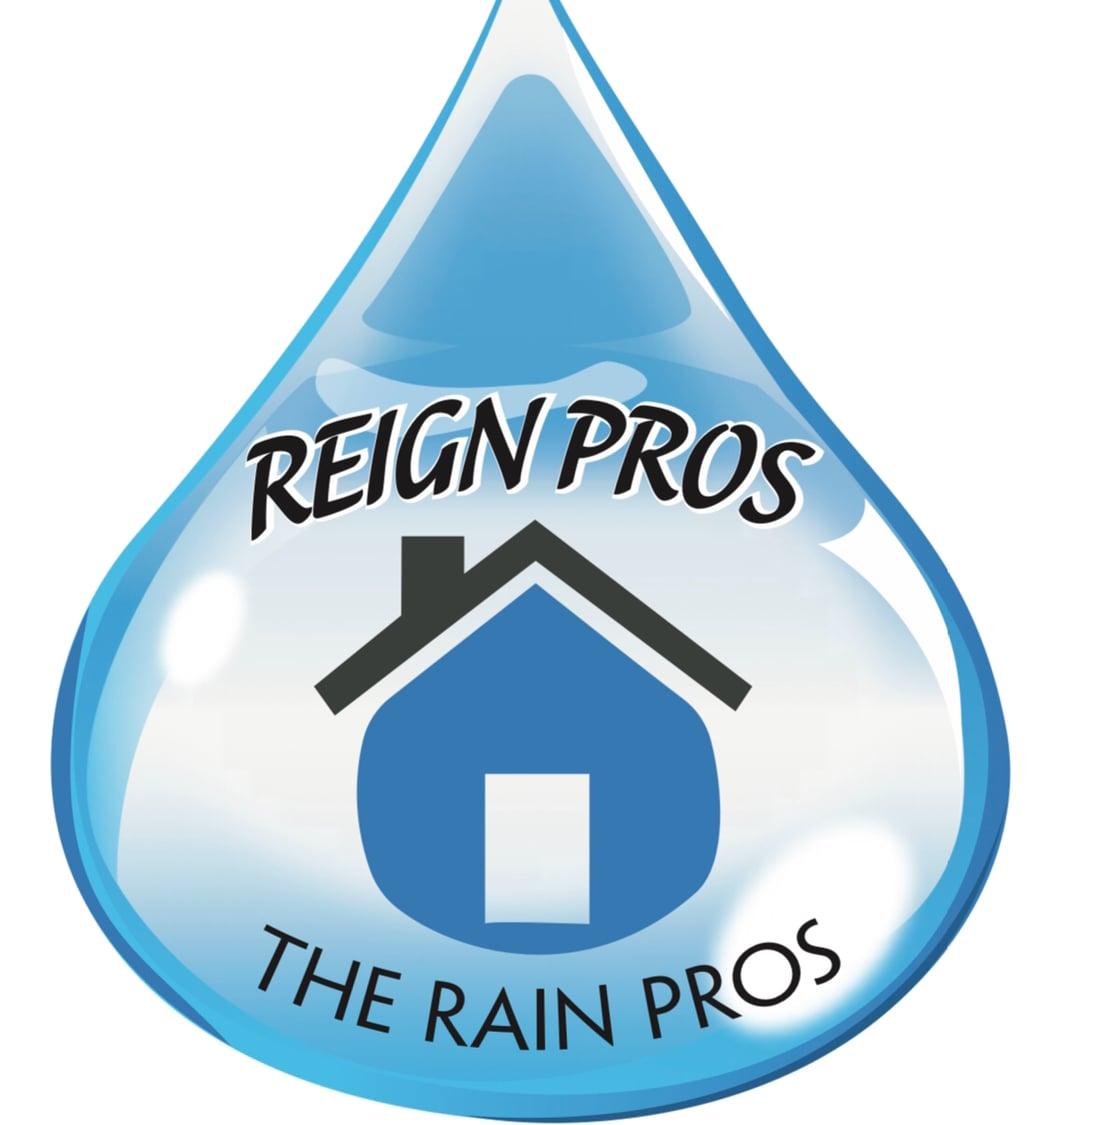 Reign Pros, LLC